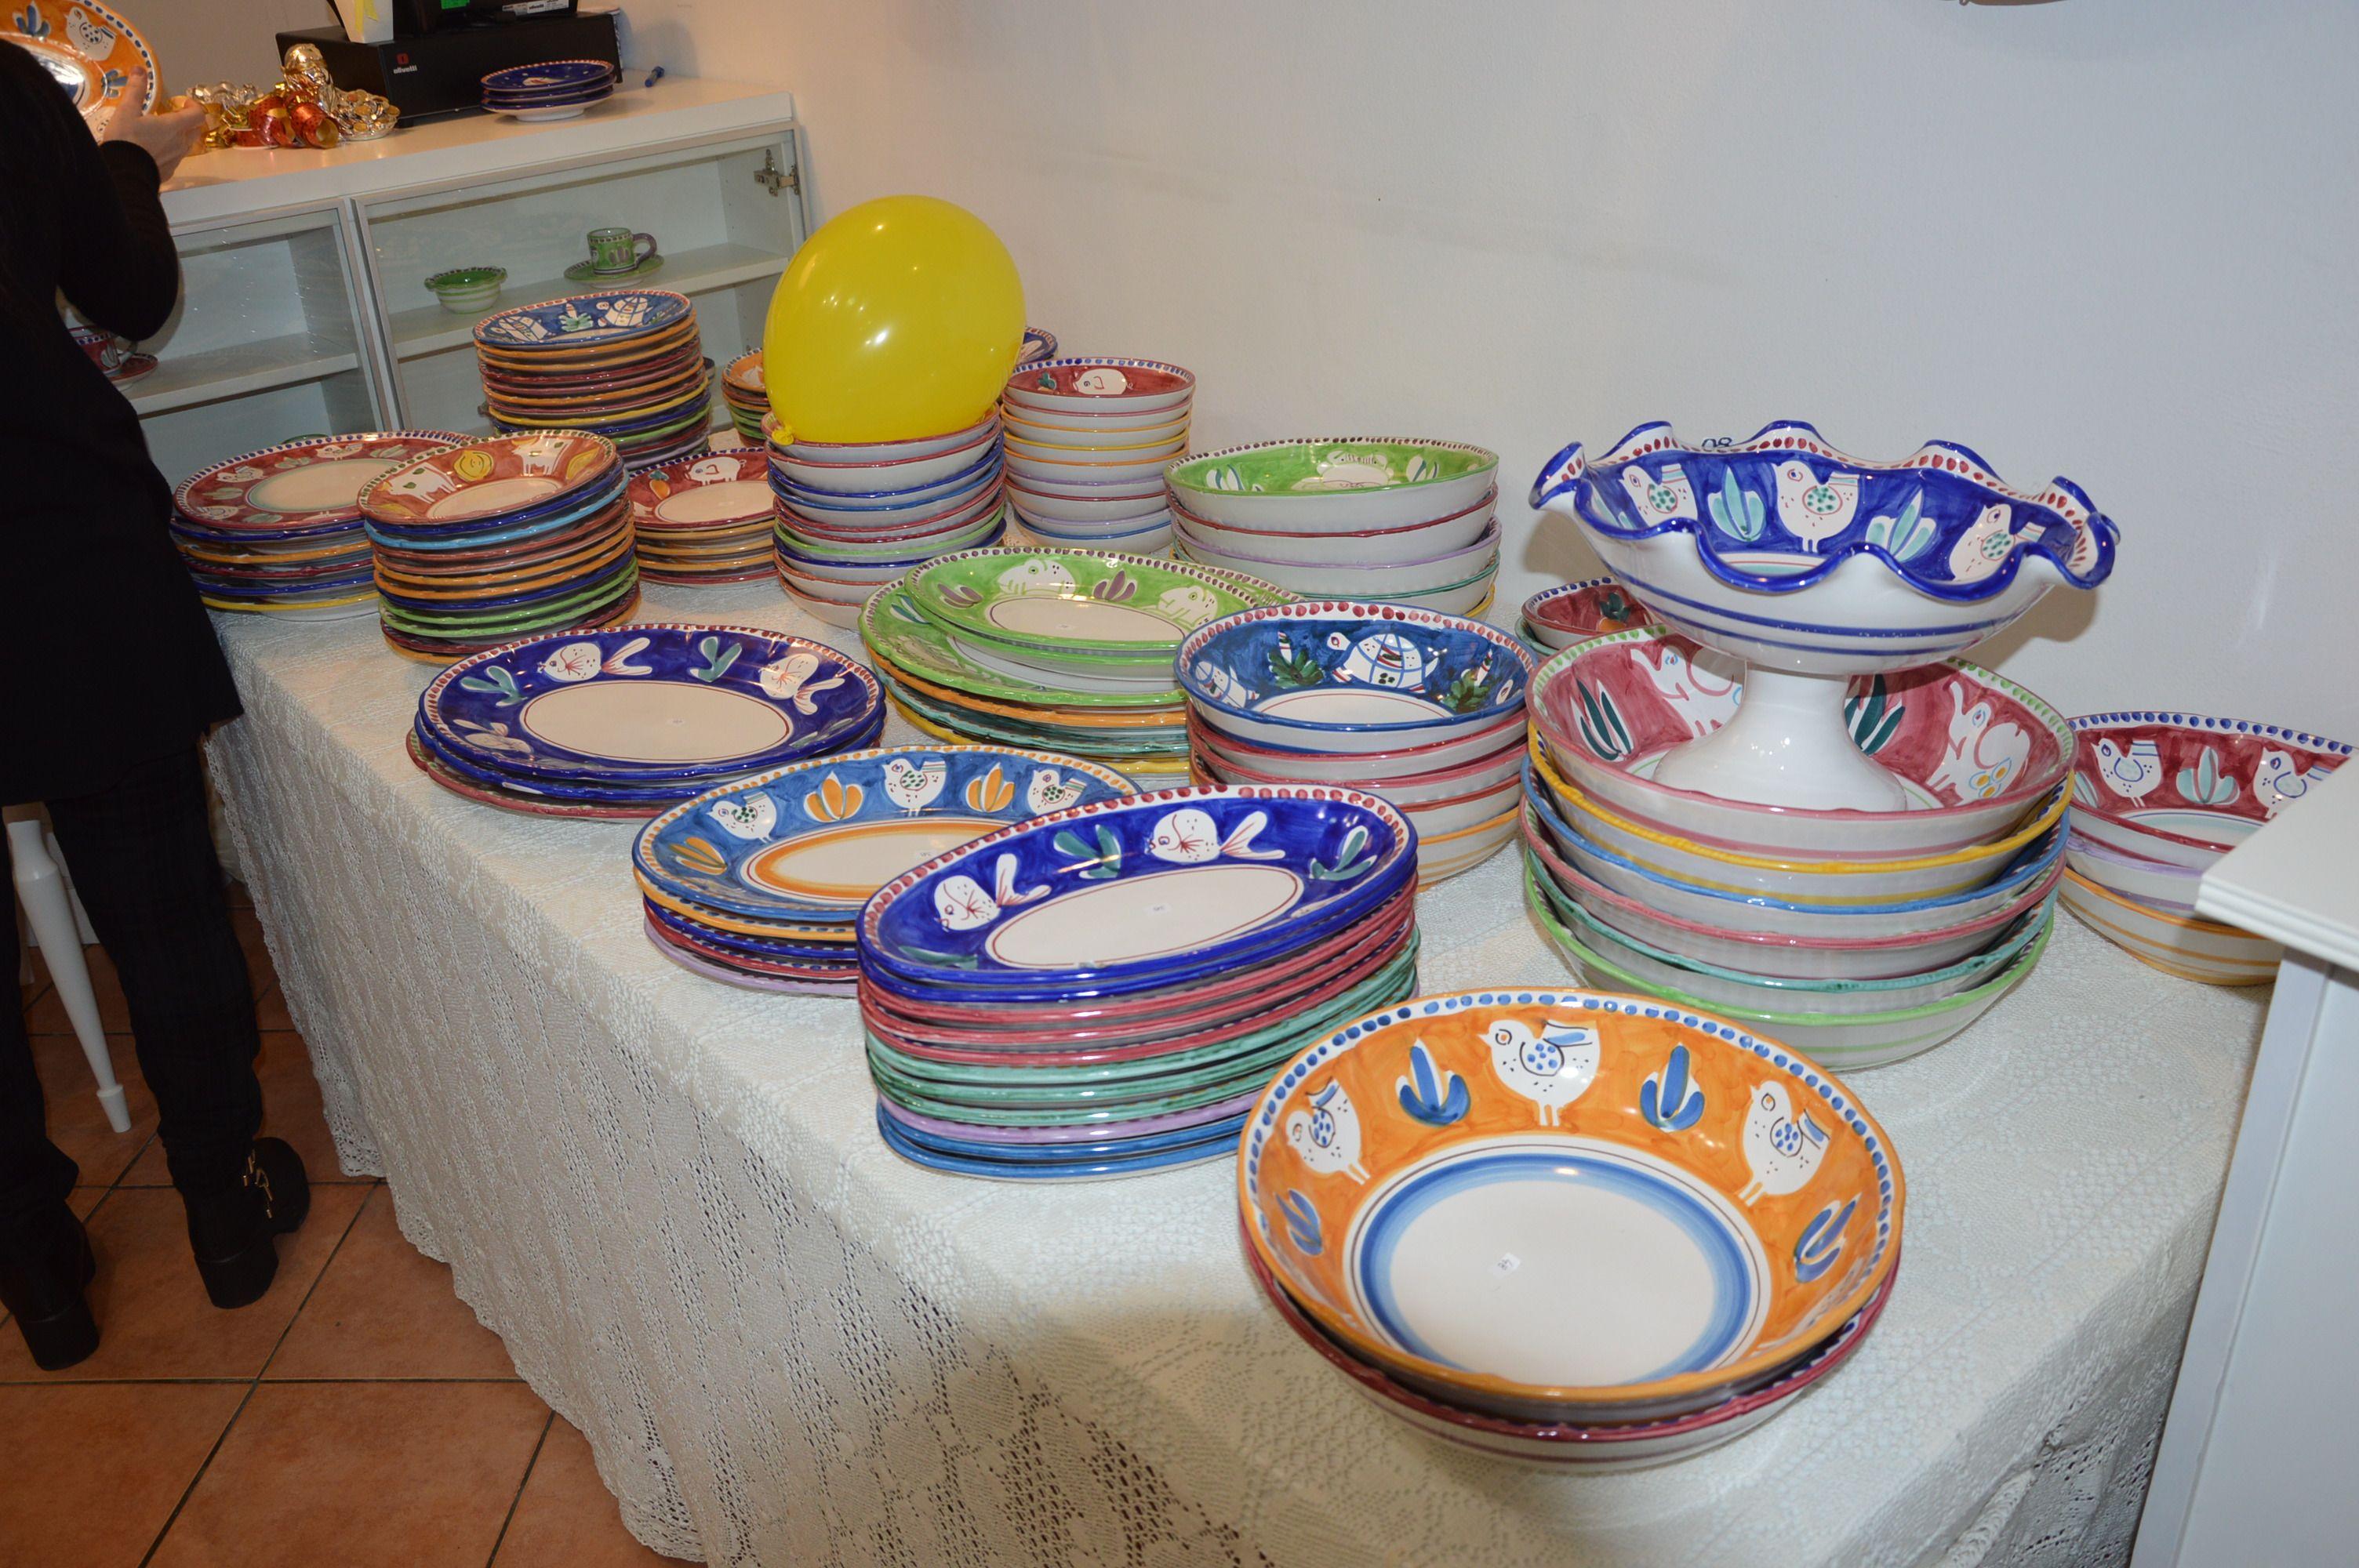 Sorrento Ceramica Artistica Solimene Modena | Solimene